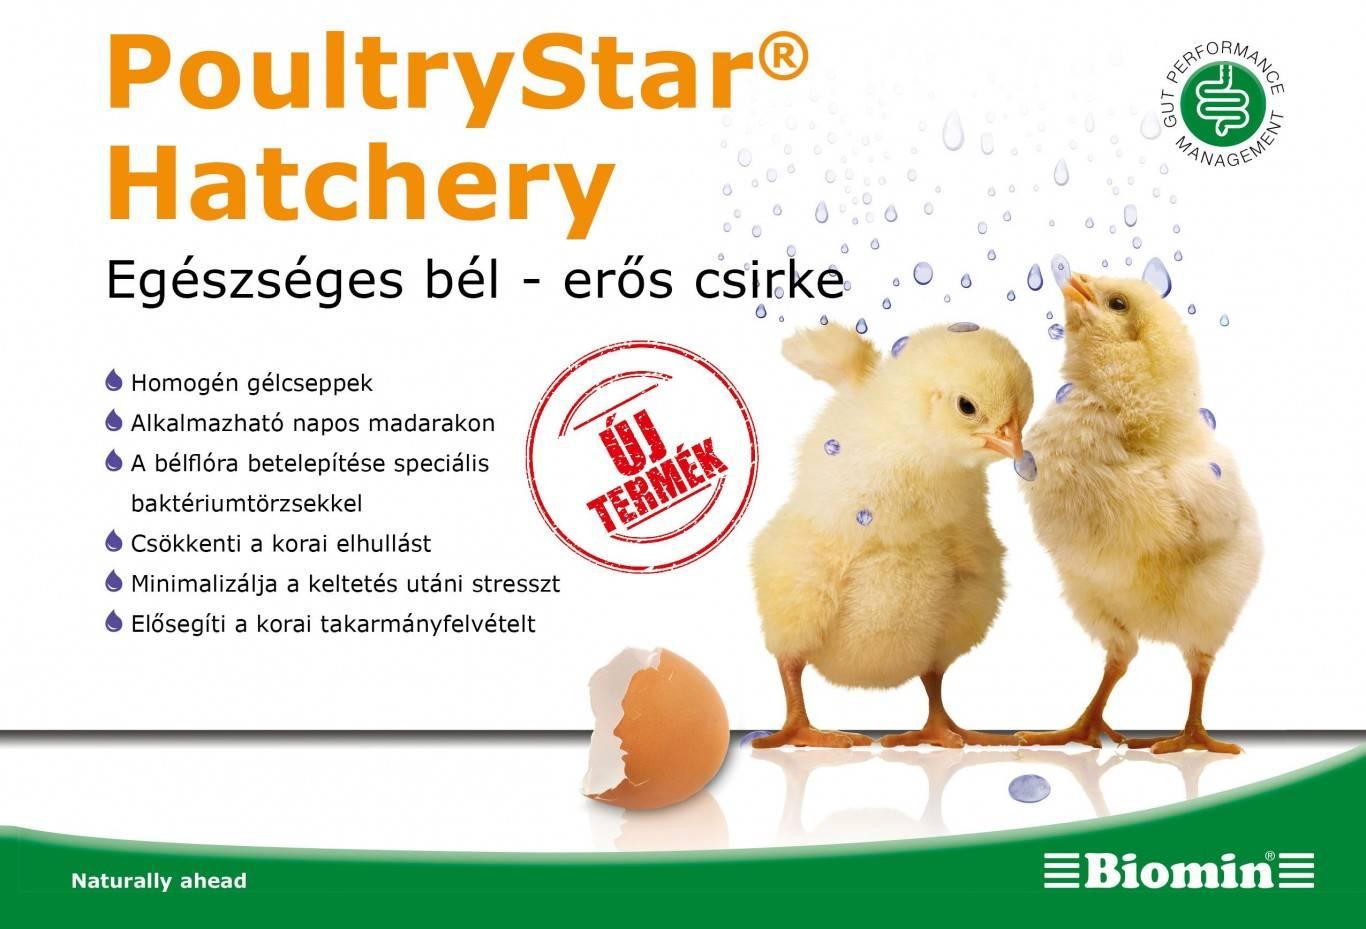 biomin-poultry-star-hatchery